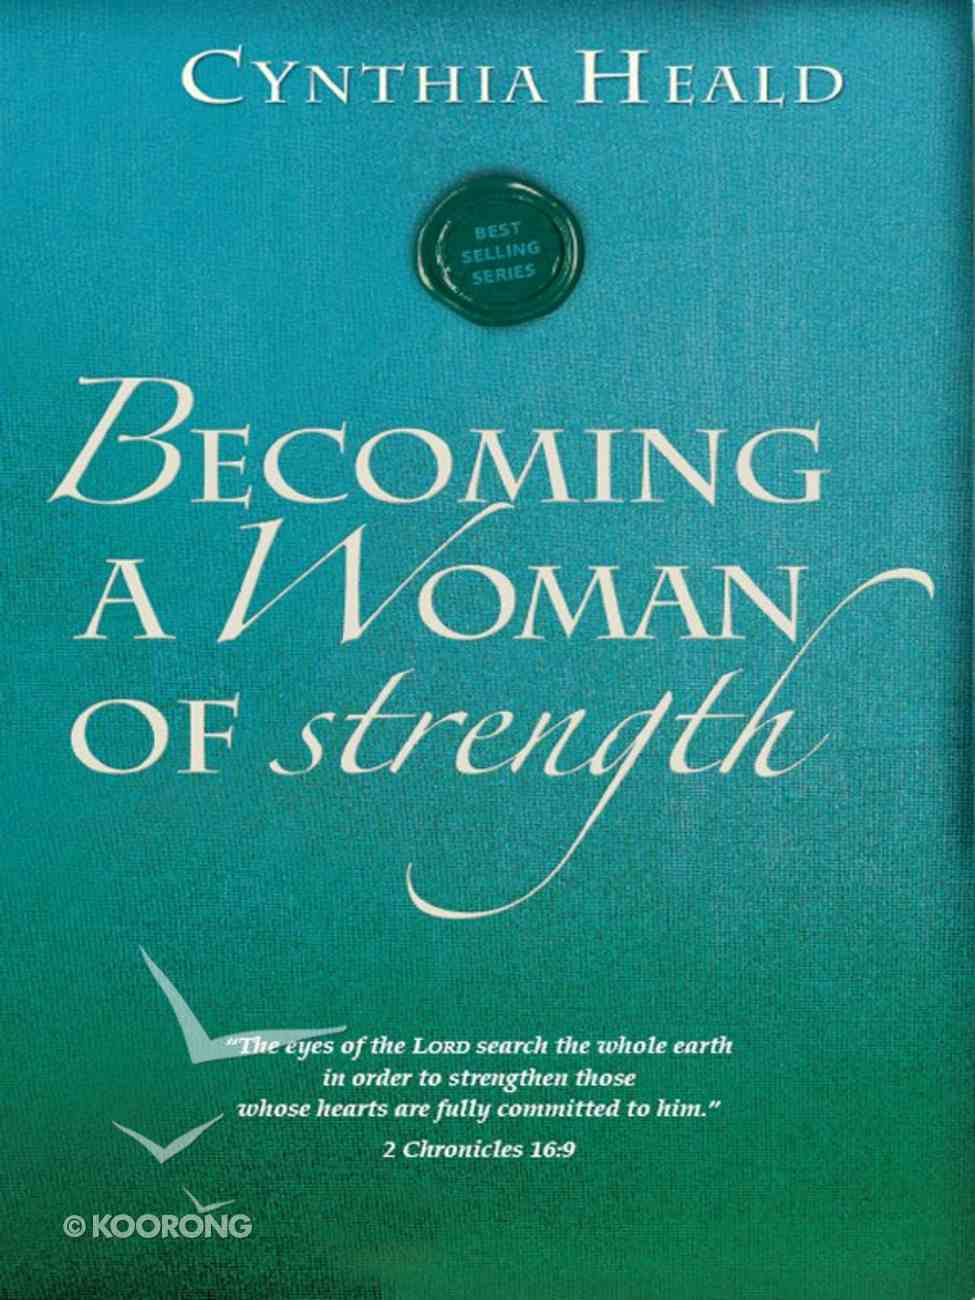 Becoming a Woman of Strength (Becoming A Woman Bible Studies Series) eBook